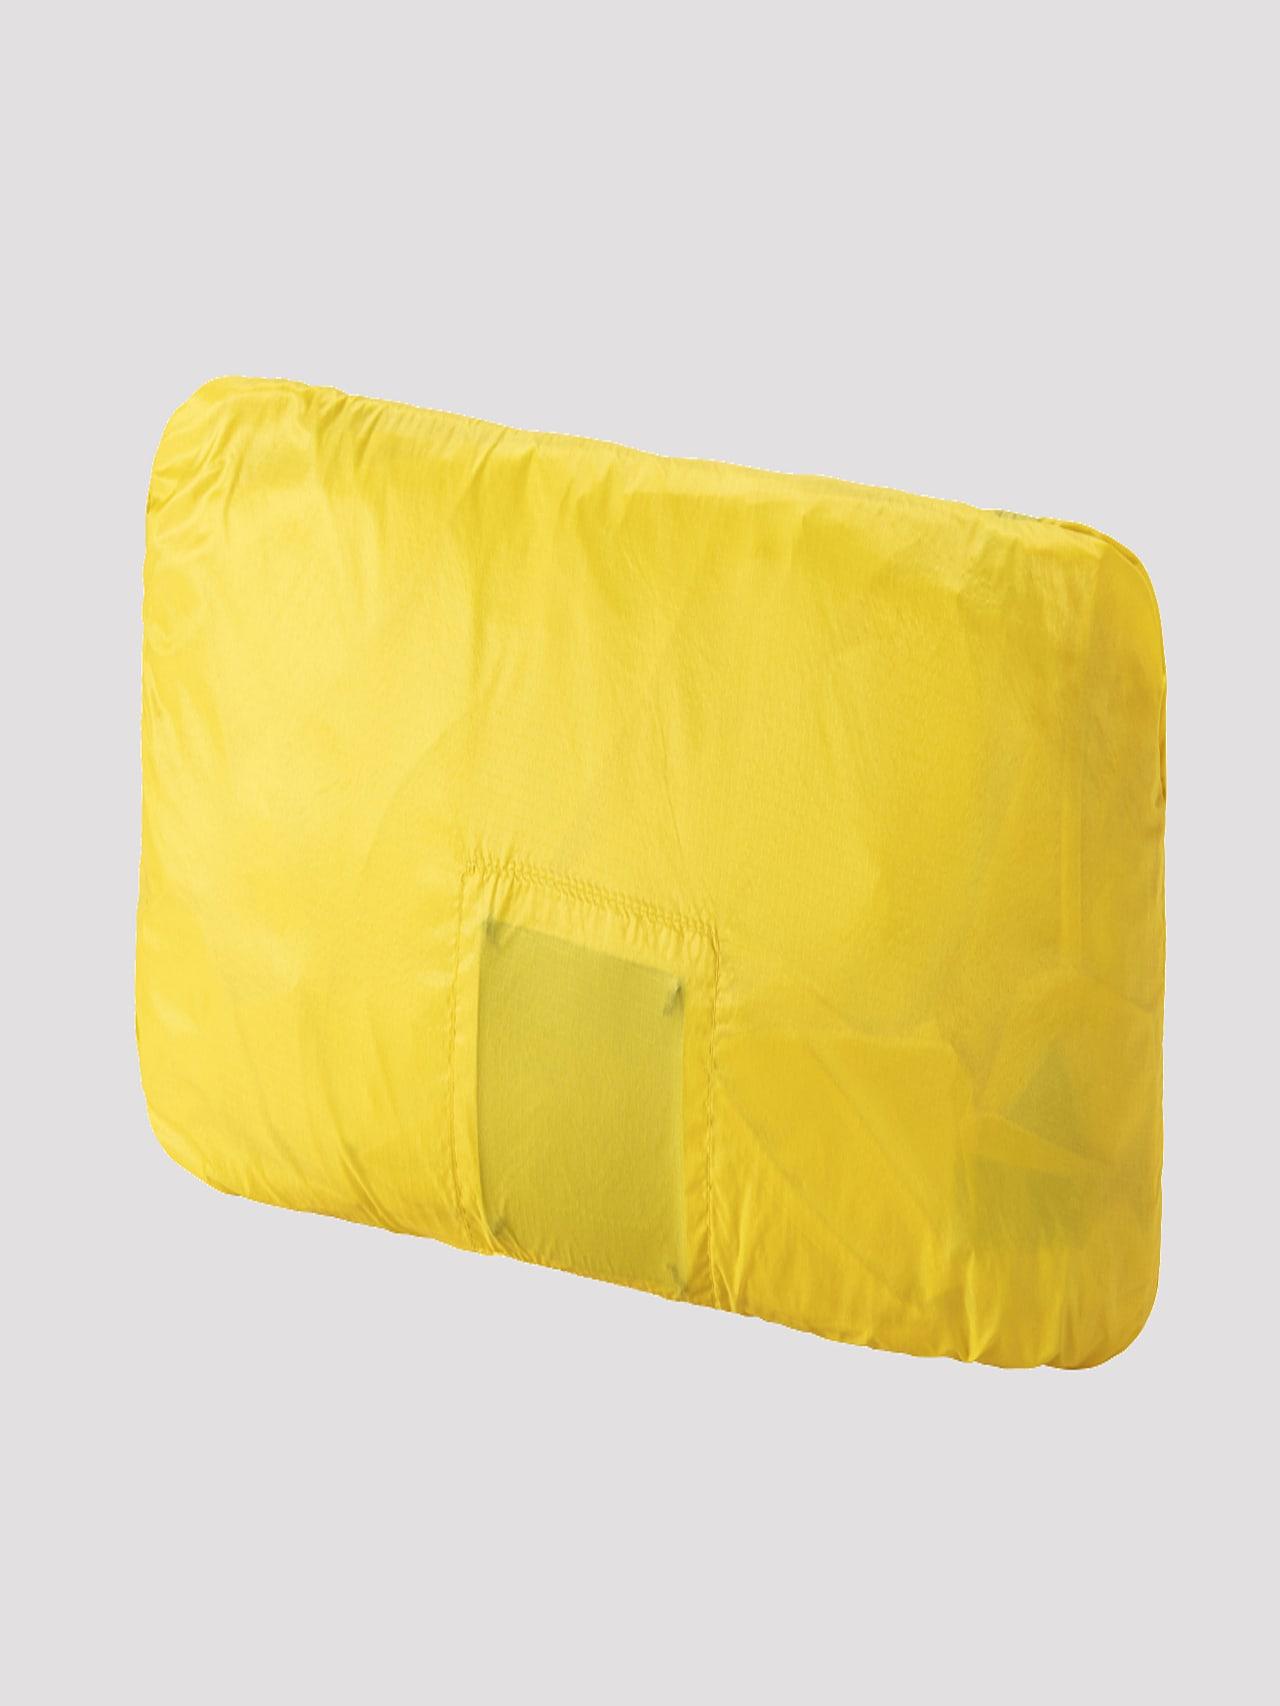 OLONO V2.Y5.01 Packable Windbreaker Coat yellow scene7.view.8.name Alpha Tauri